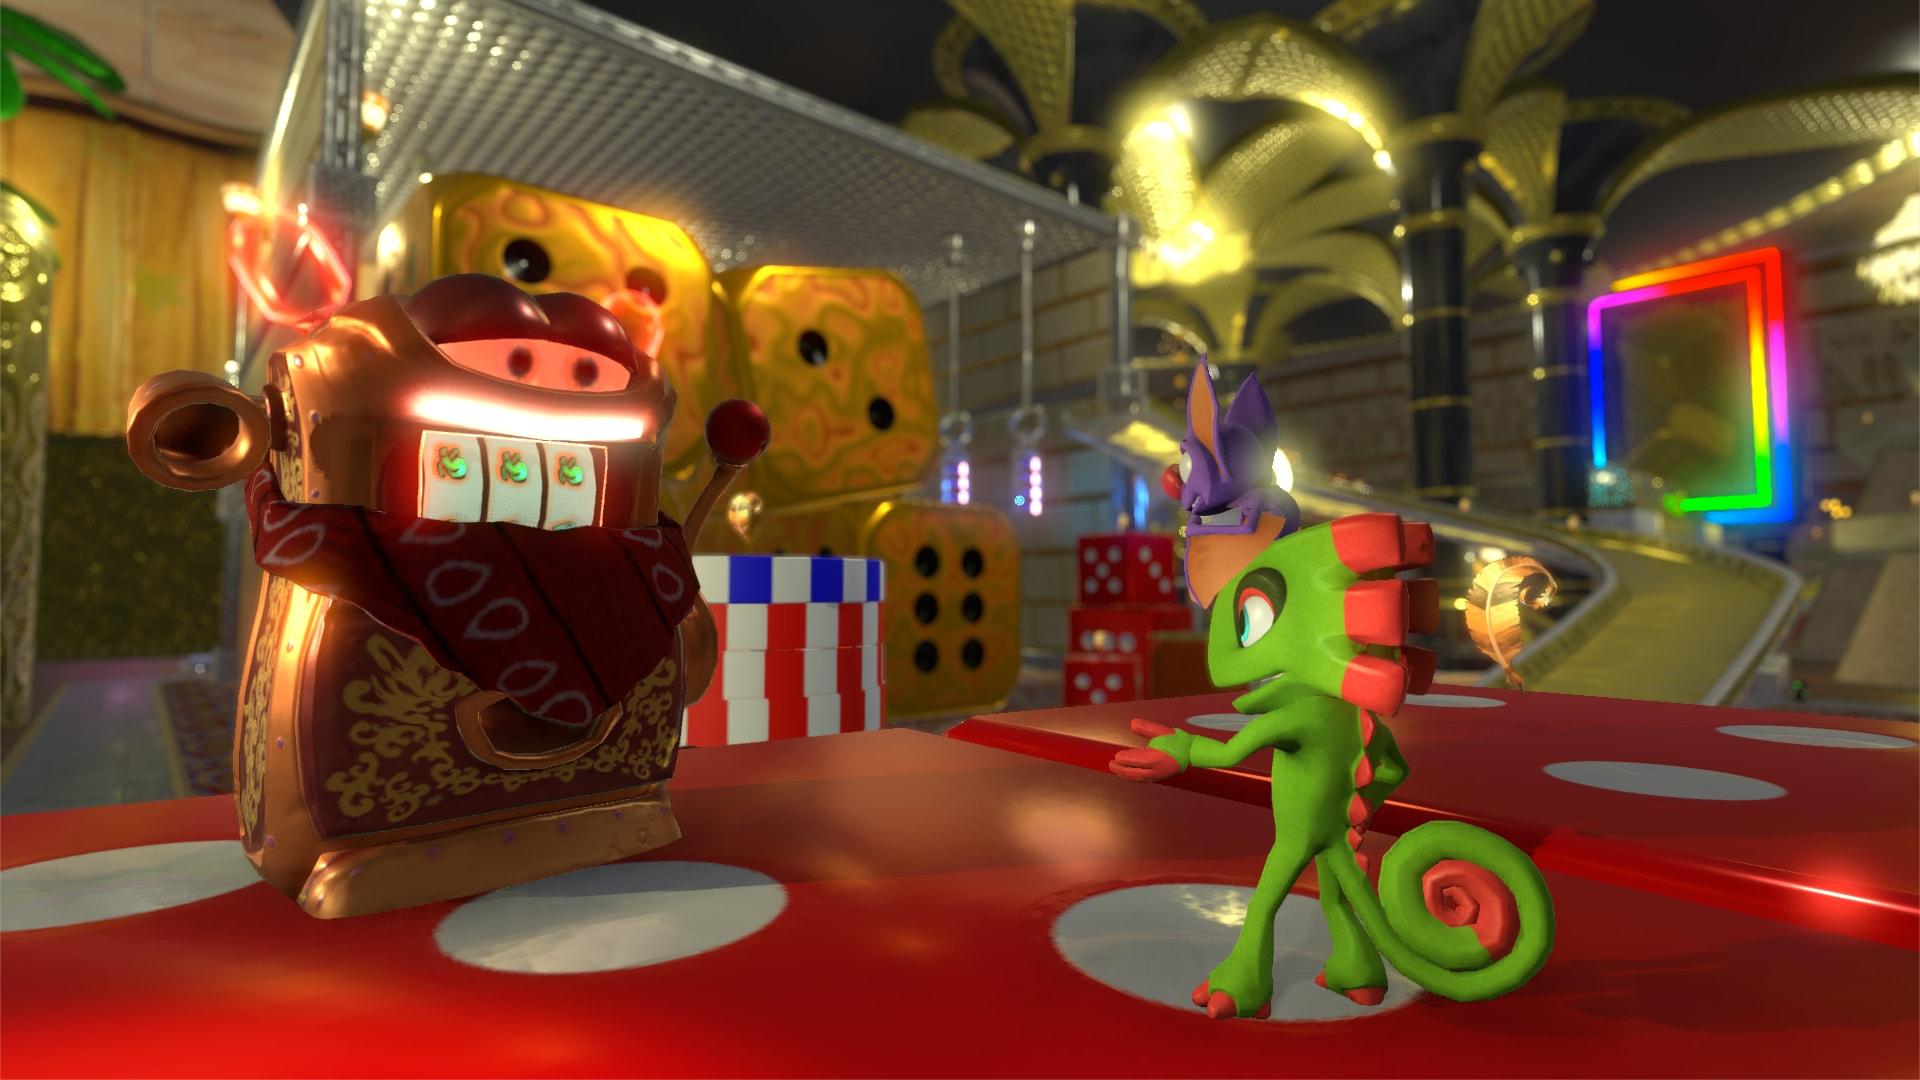 Yooka-Laylee oznamuje mega multiplayerové režimy 136744